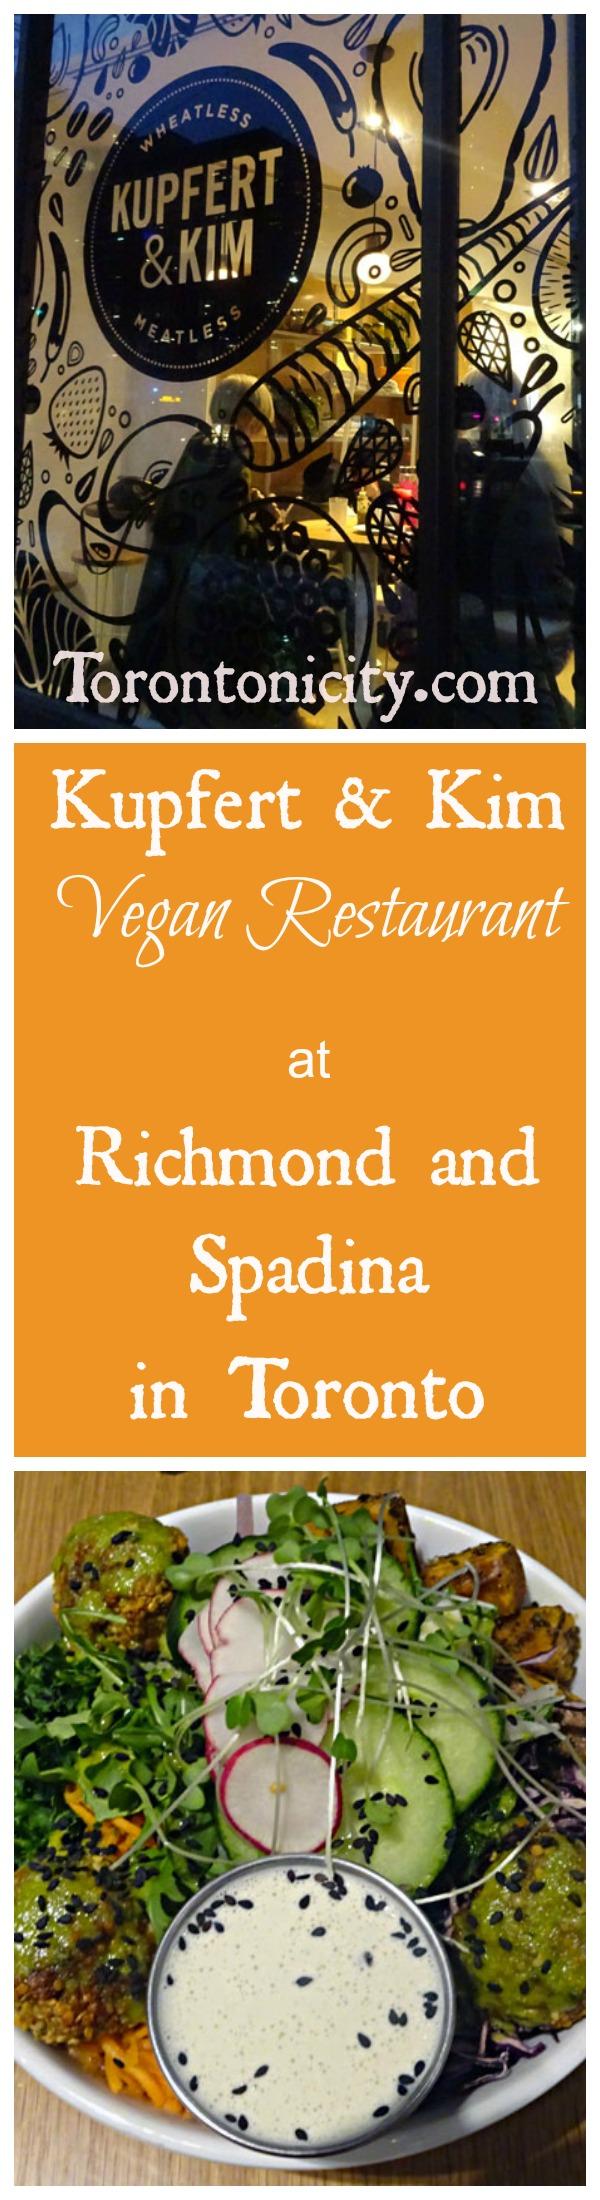 Kupfert Kim Vegan Restaurant At Richmond Street And Spadina Avenue In Toronto